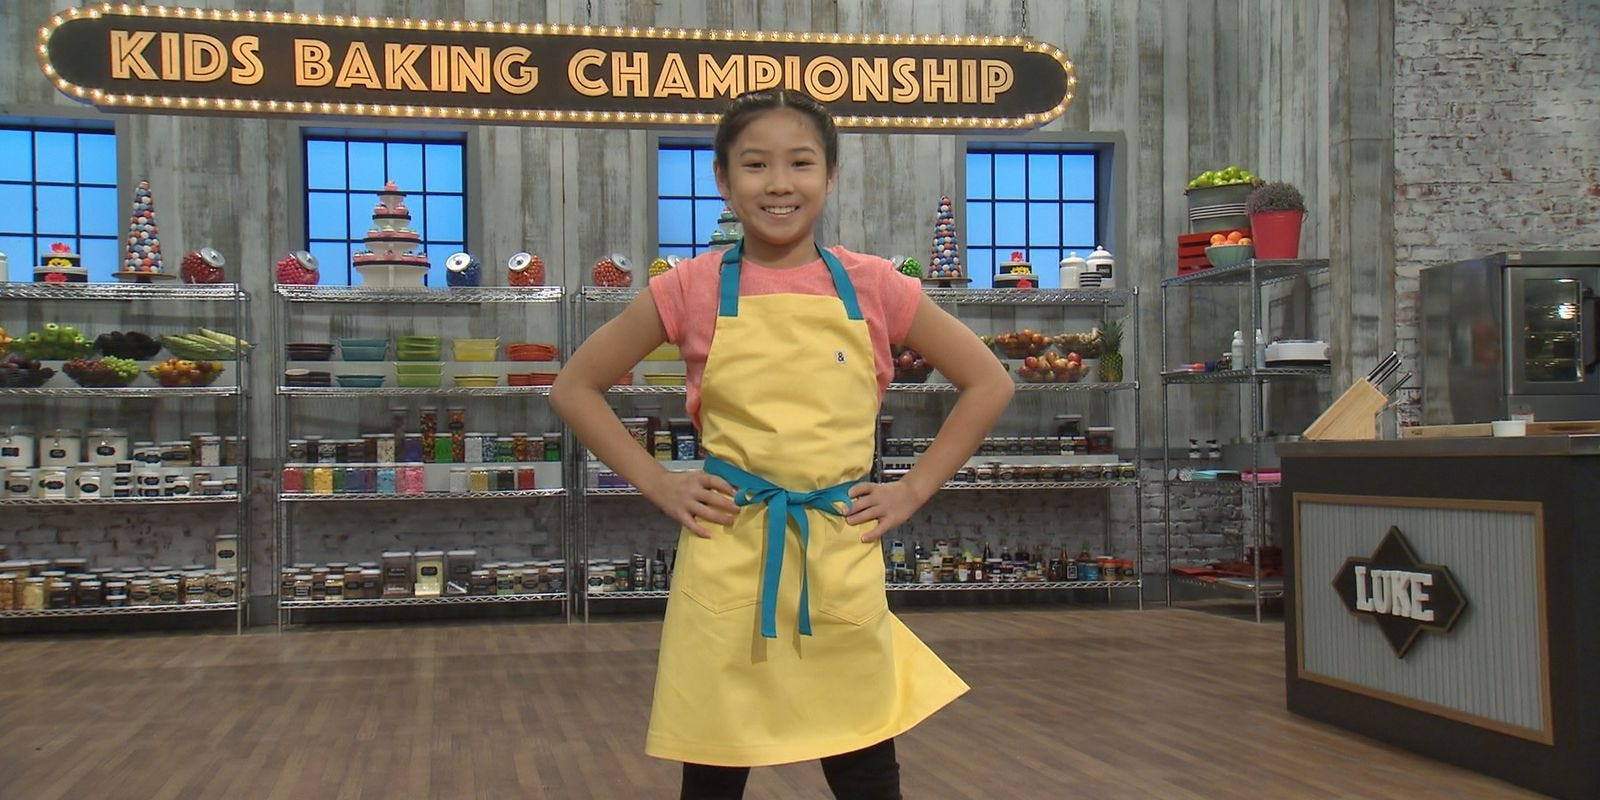 Christmas Baking Championship 2019  Kids Baking Championship winner Linsey Lam on her victory